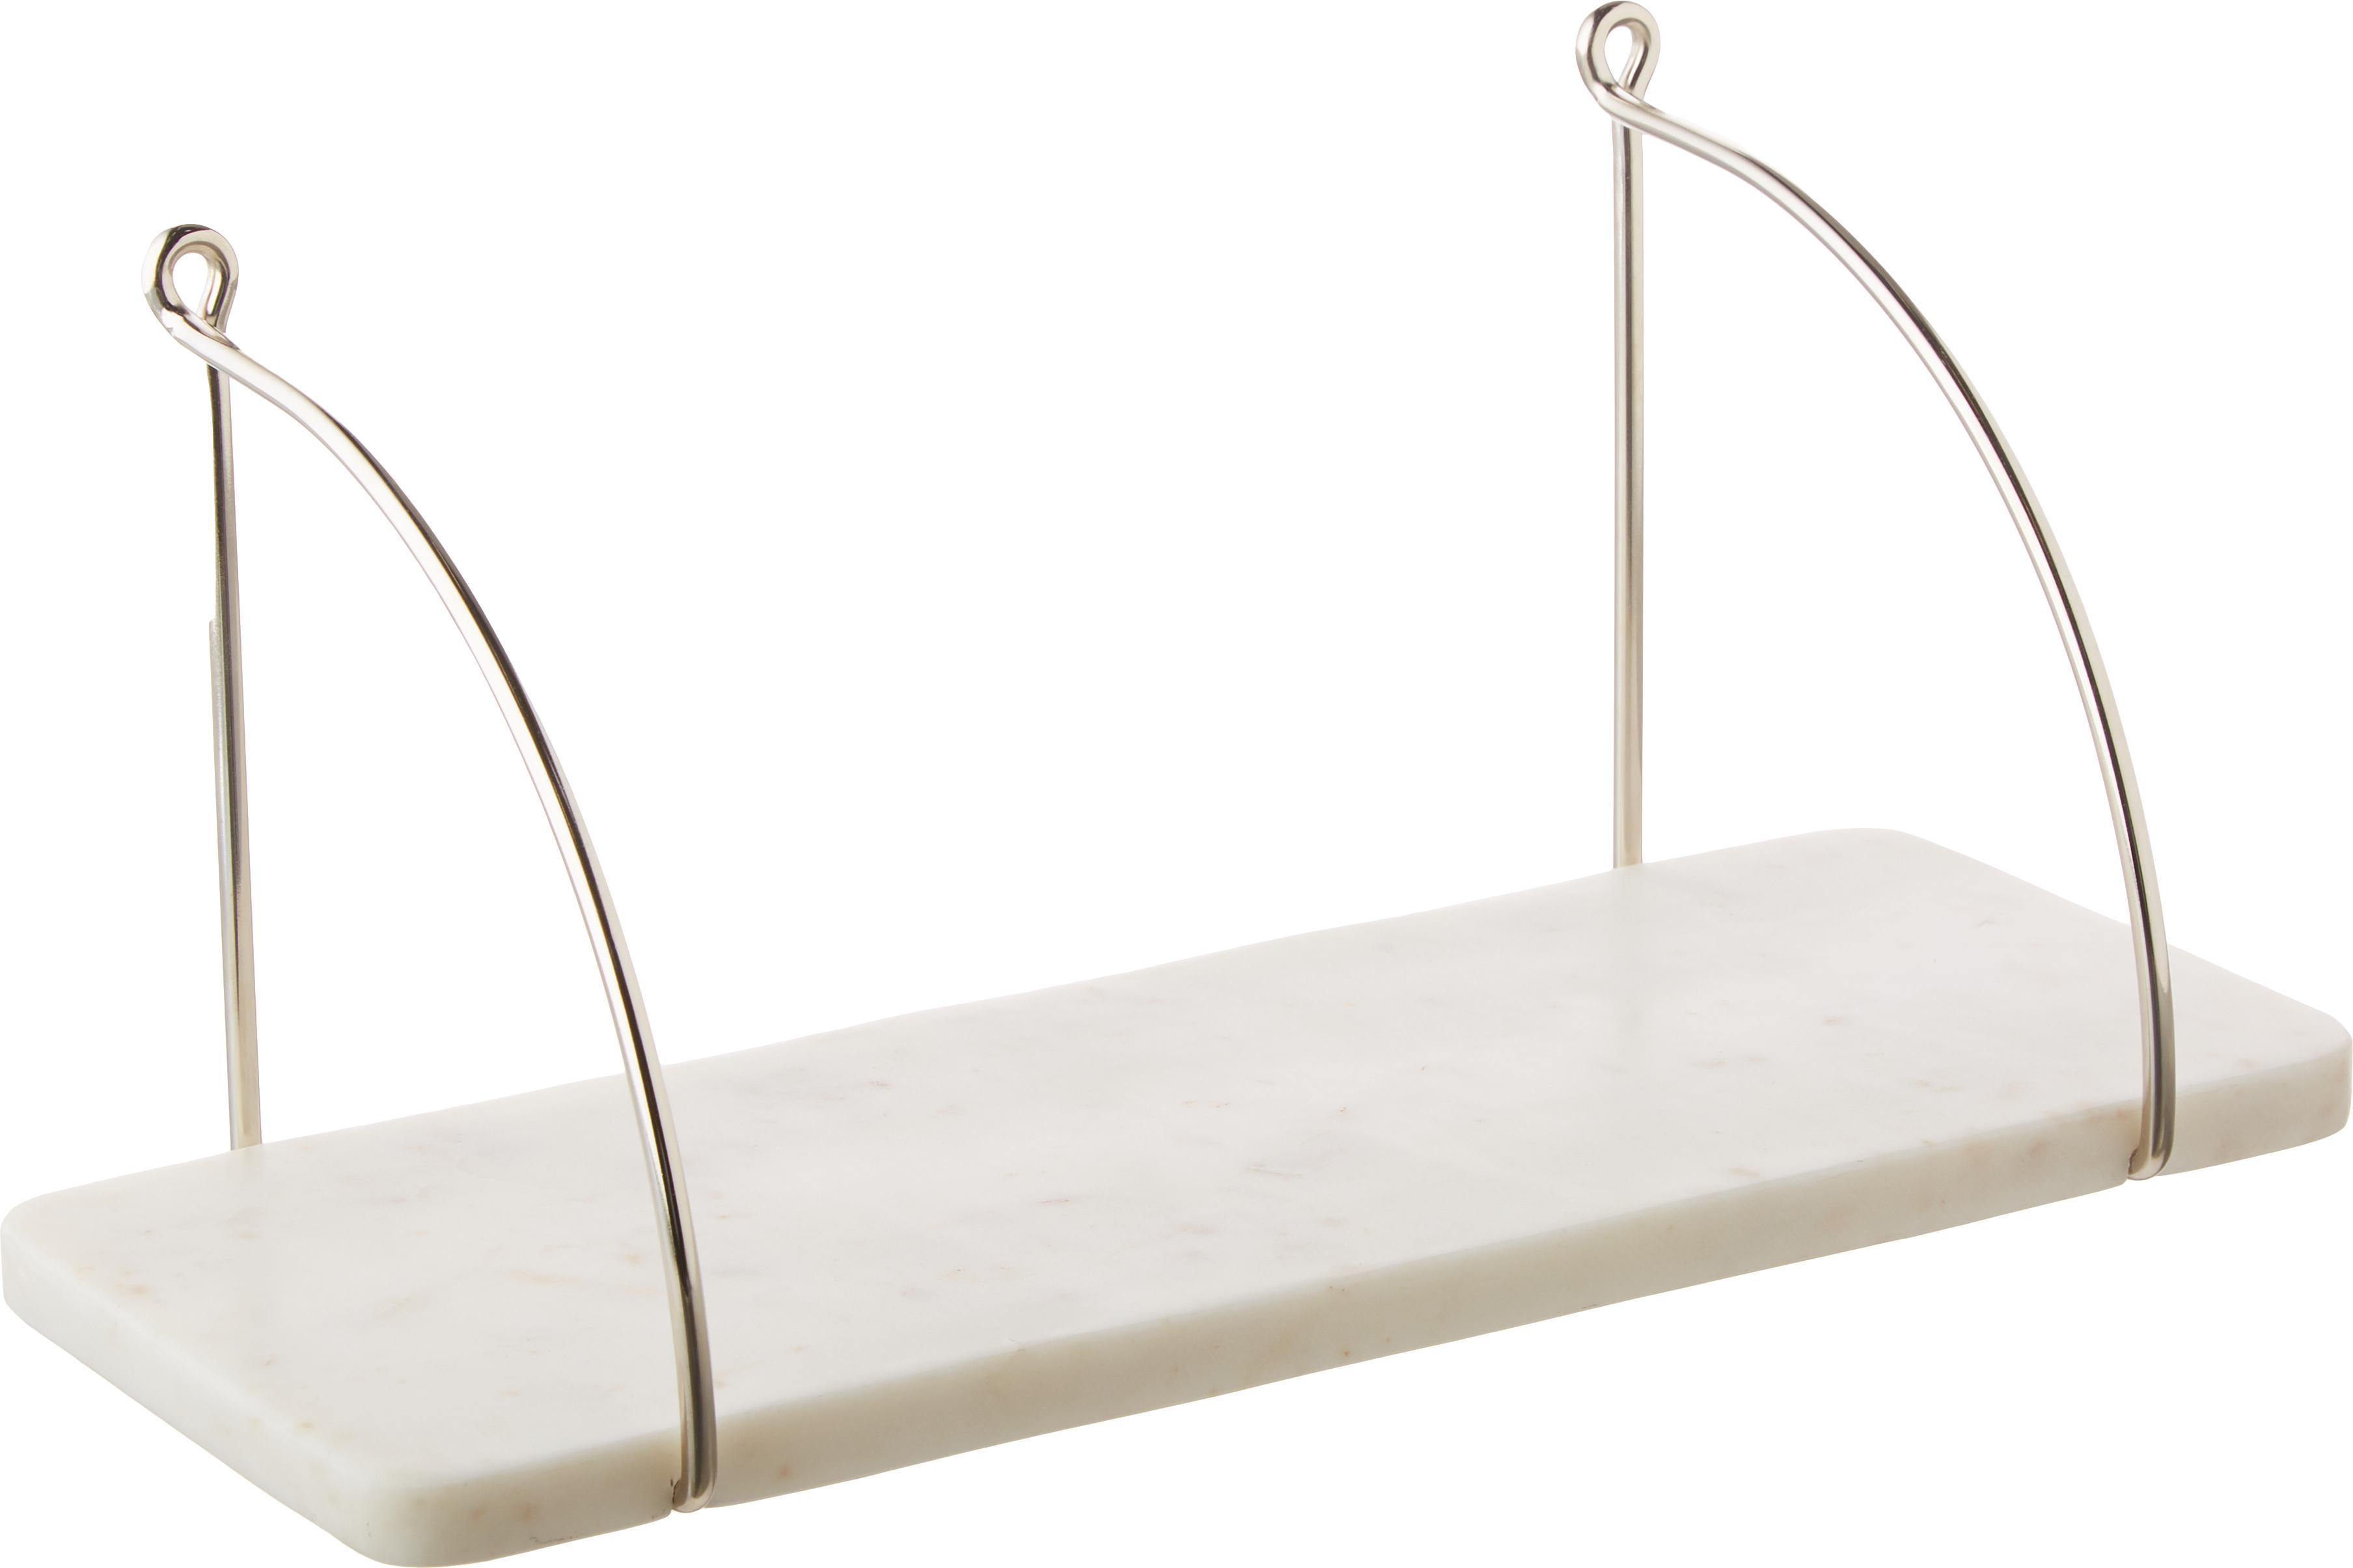 Estante de pared de mármol Porter, Estante: mármol, Acero, mármol blanco, An 40 x Al 18 cm